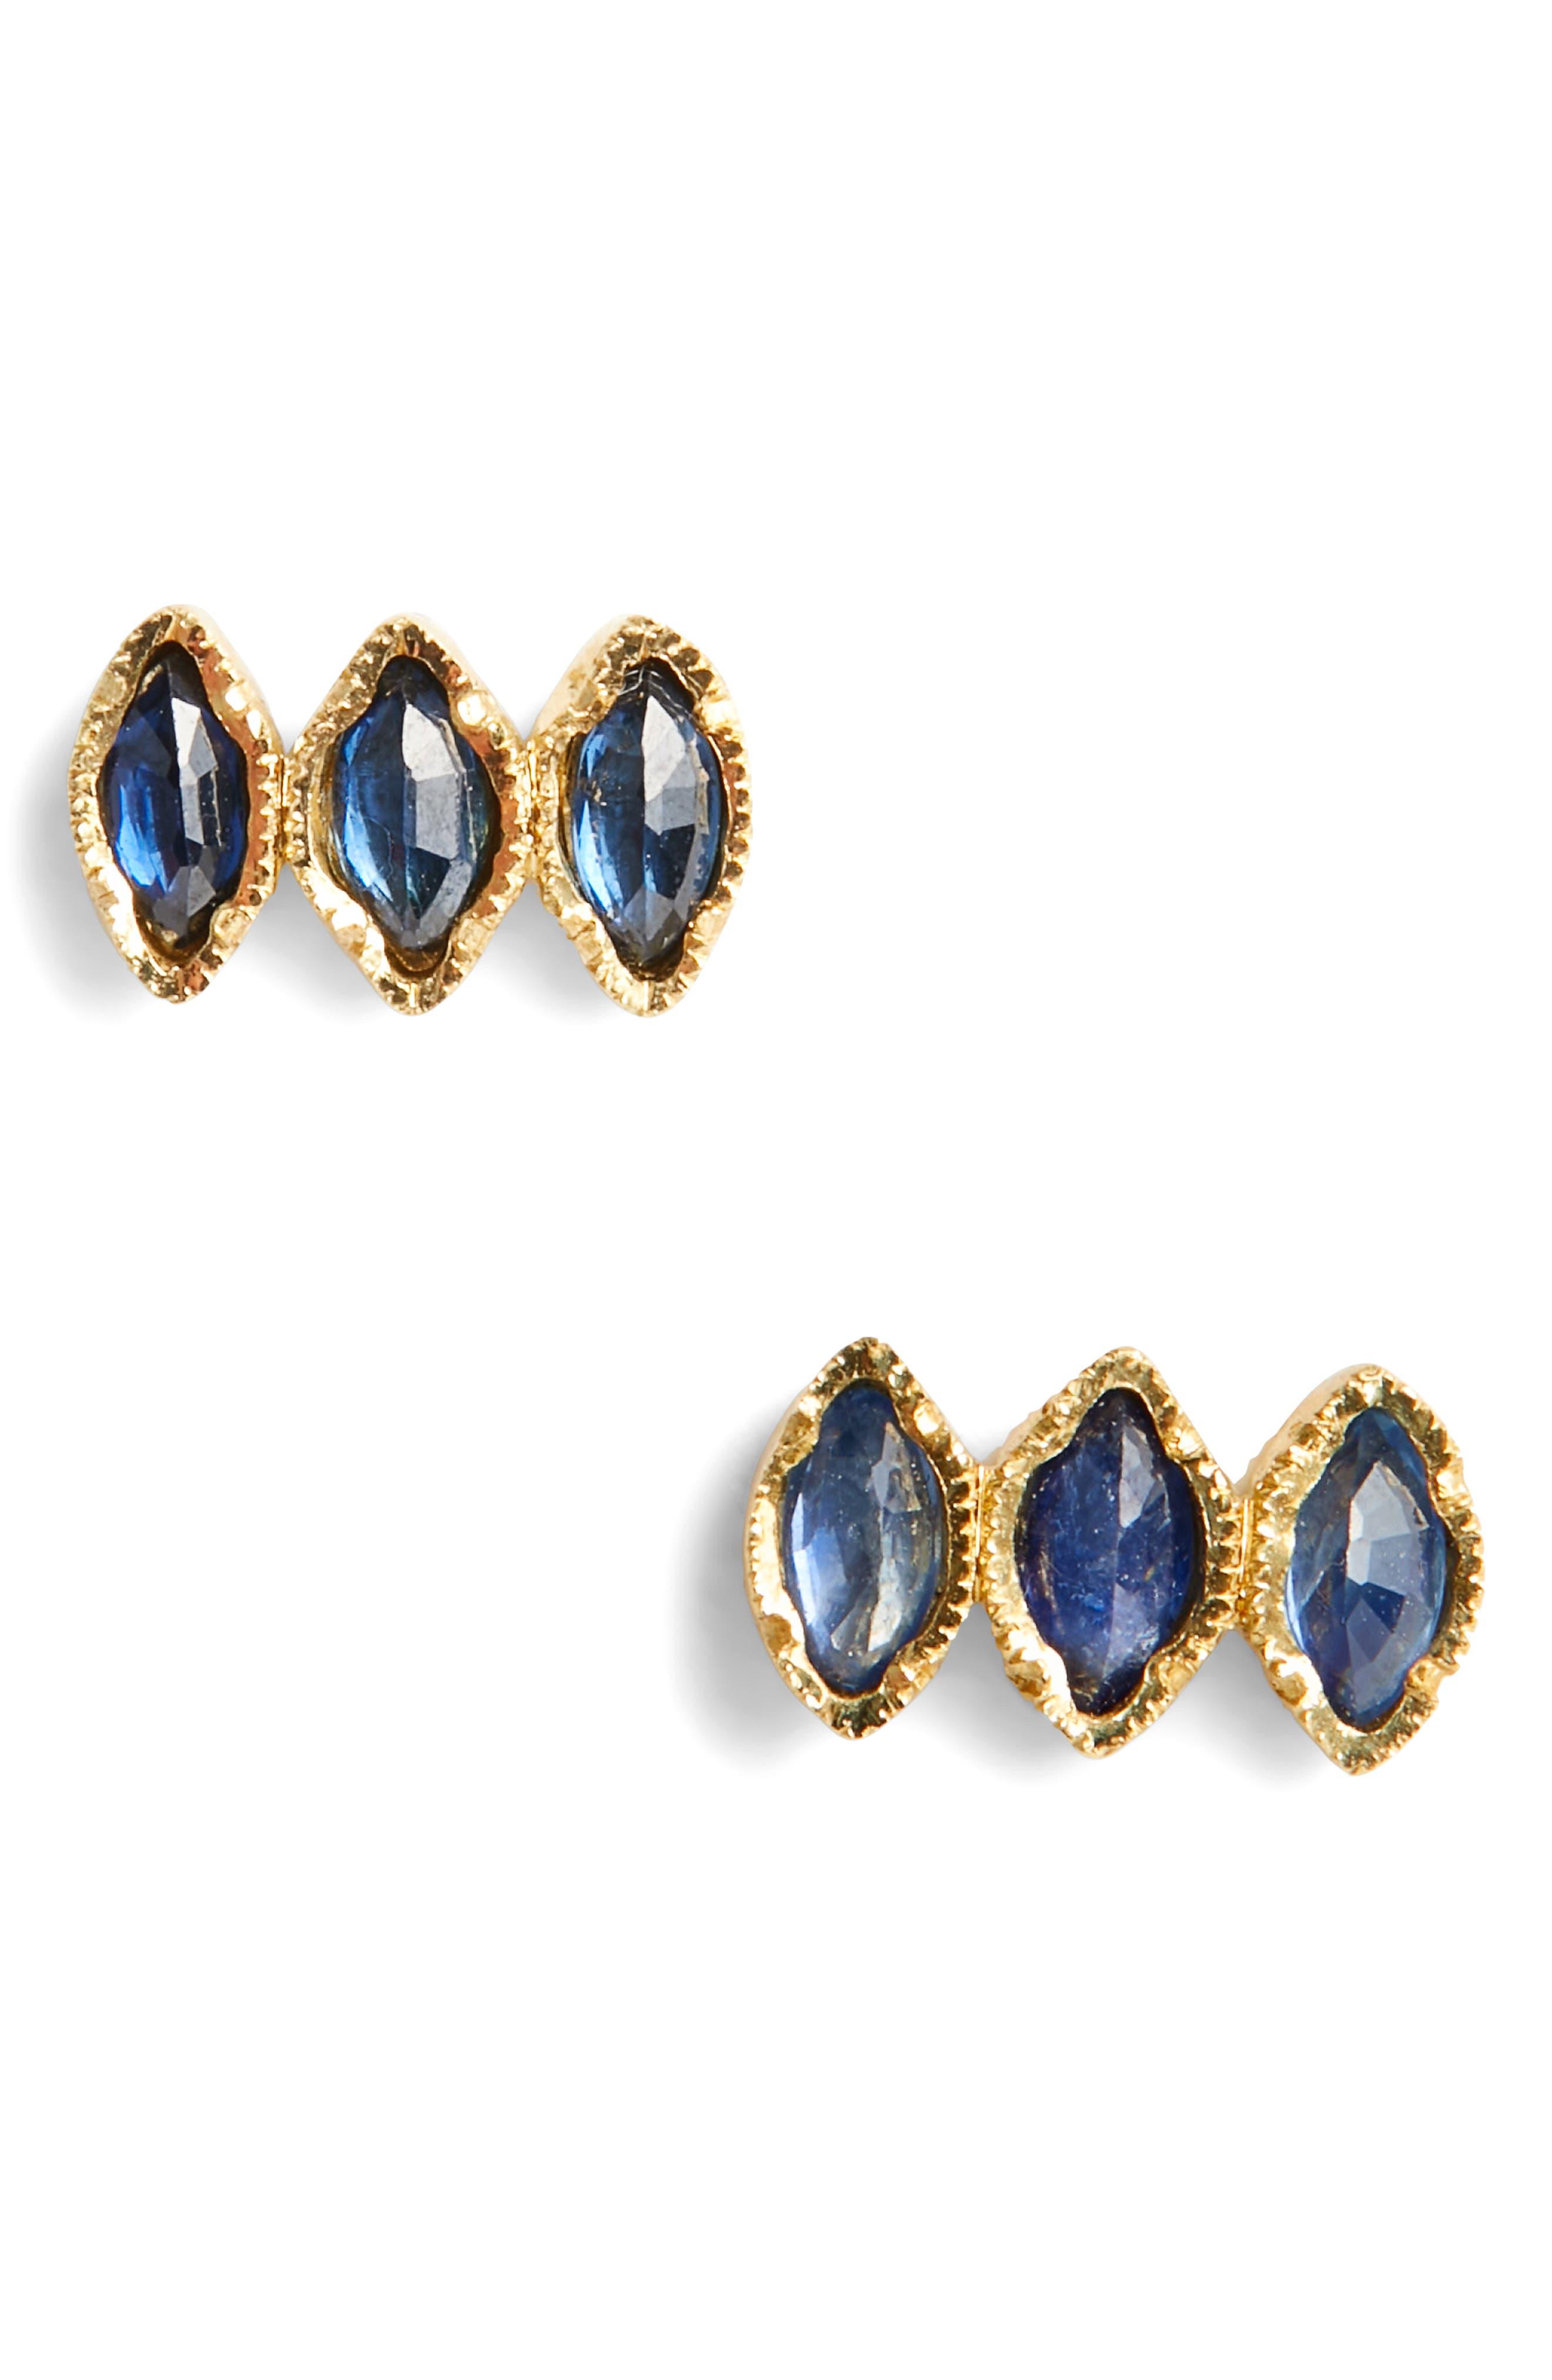 Brooke Gregson Triple Sapphire Marquise Stud Earrings